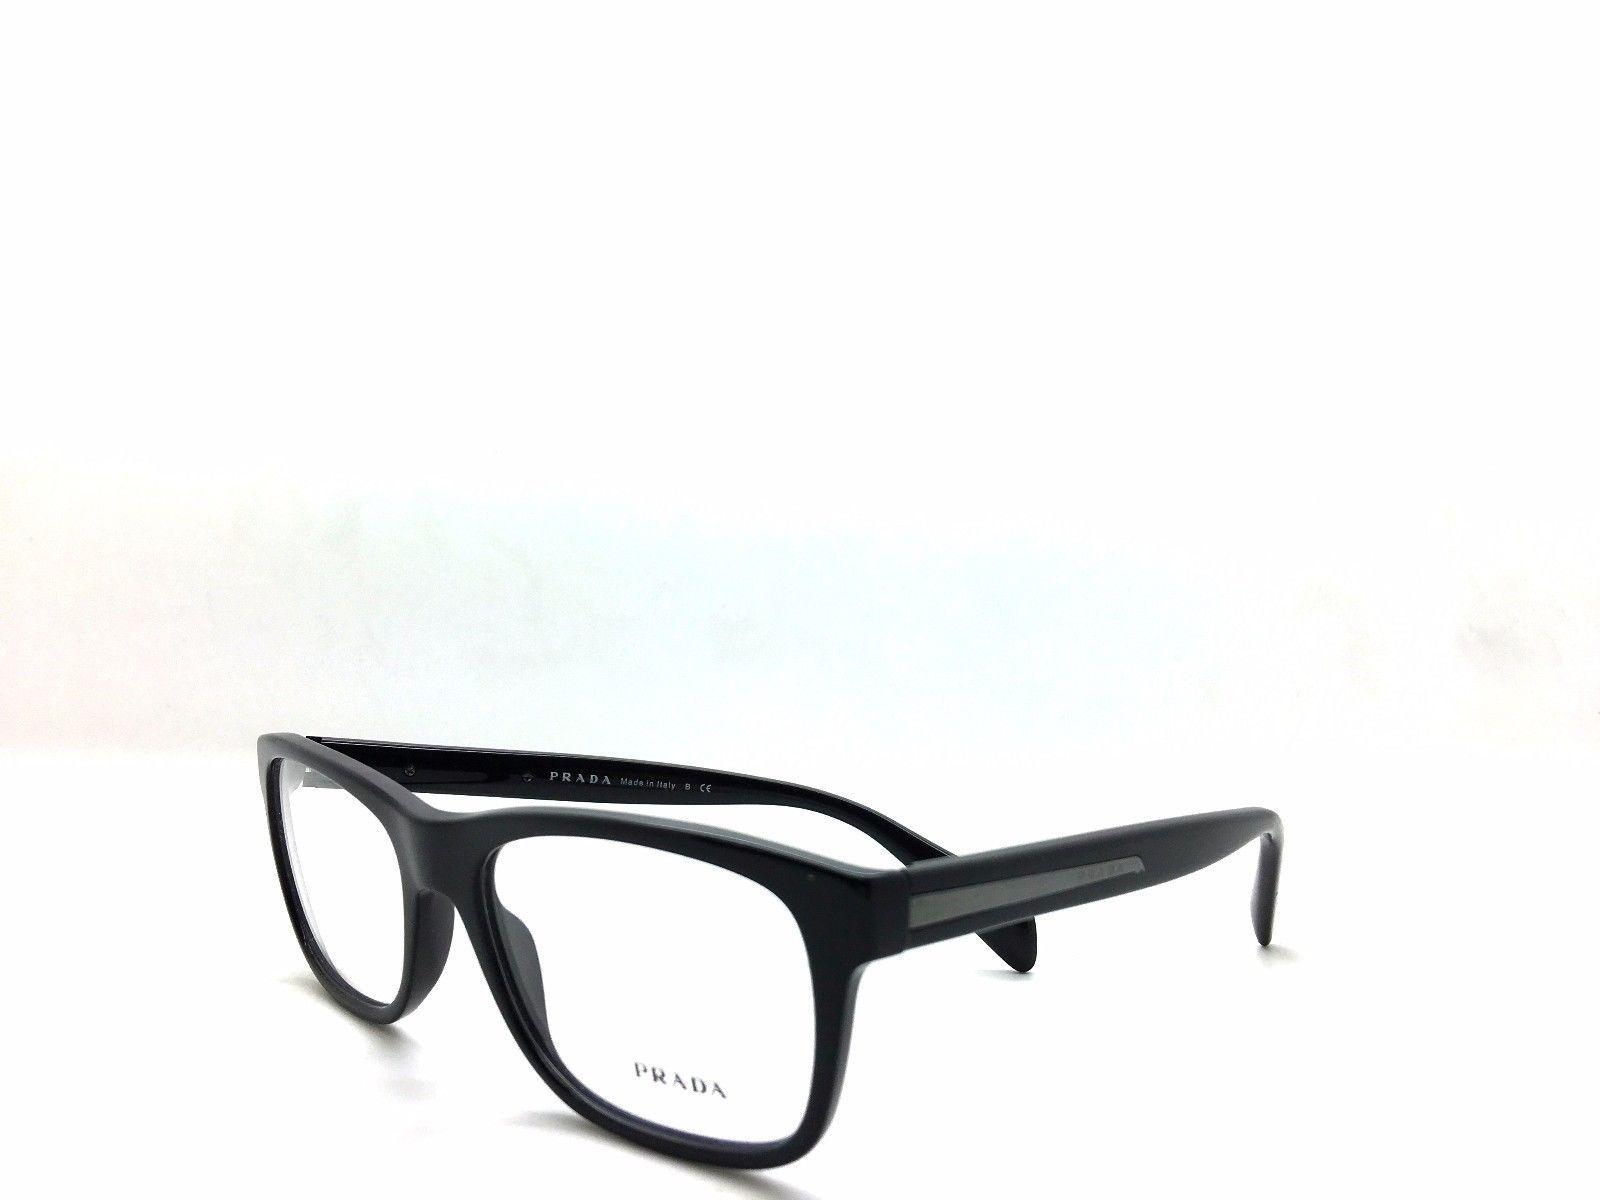 81032687c39 PRADA Shiny Gloss Black Eyeglasses VPR 19P and similar items. 57